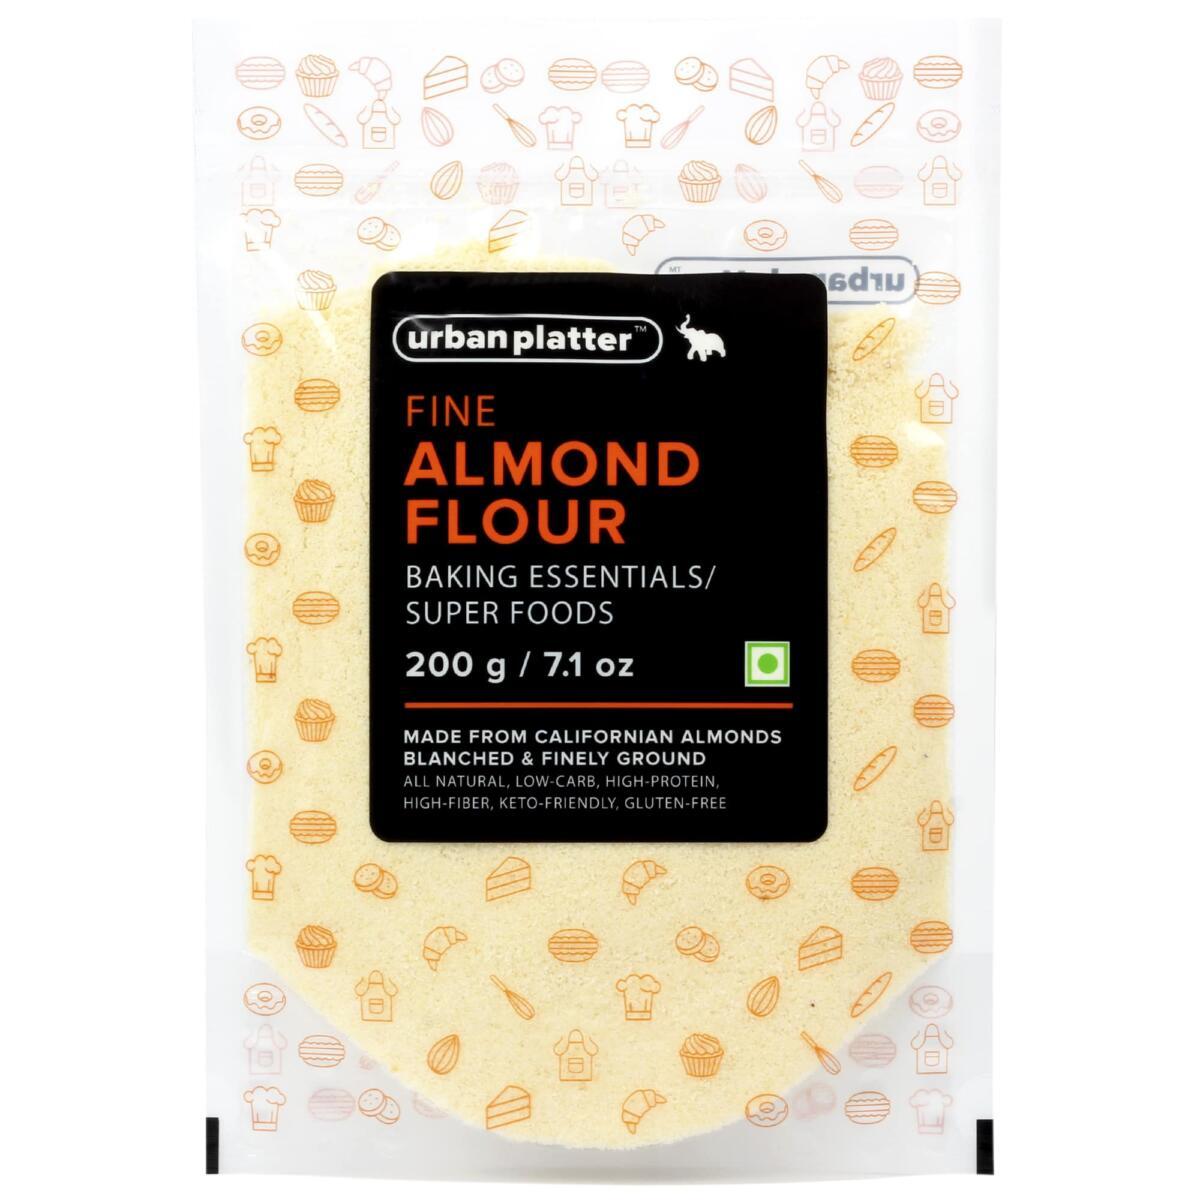 Urban Platter Fine California Almond Flour, 200g [Keto-friendly, Naturally Protein-rich, Blanched Almond Fine Powder]